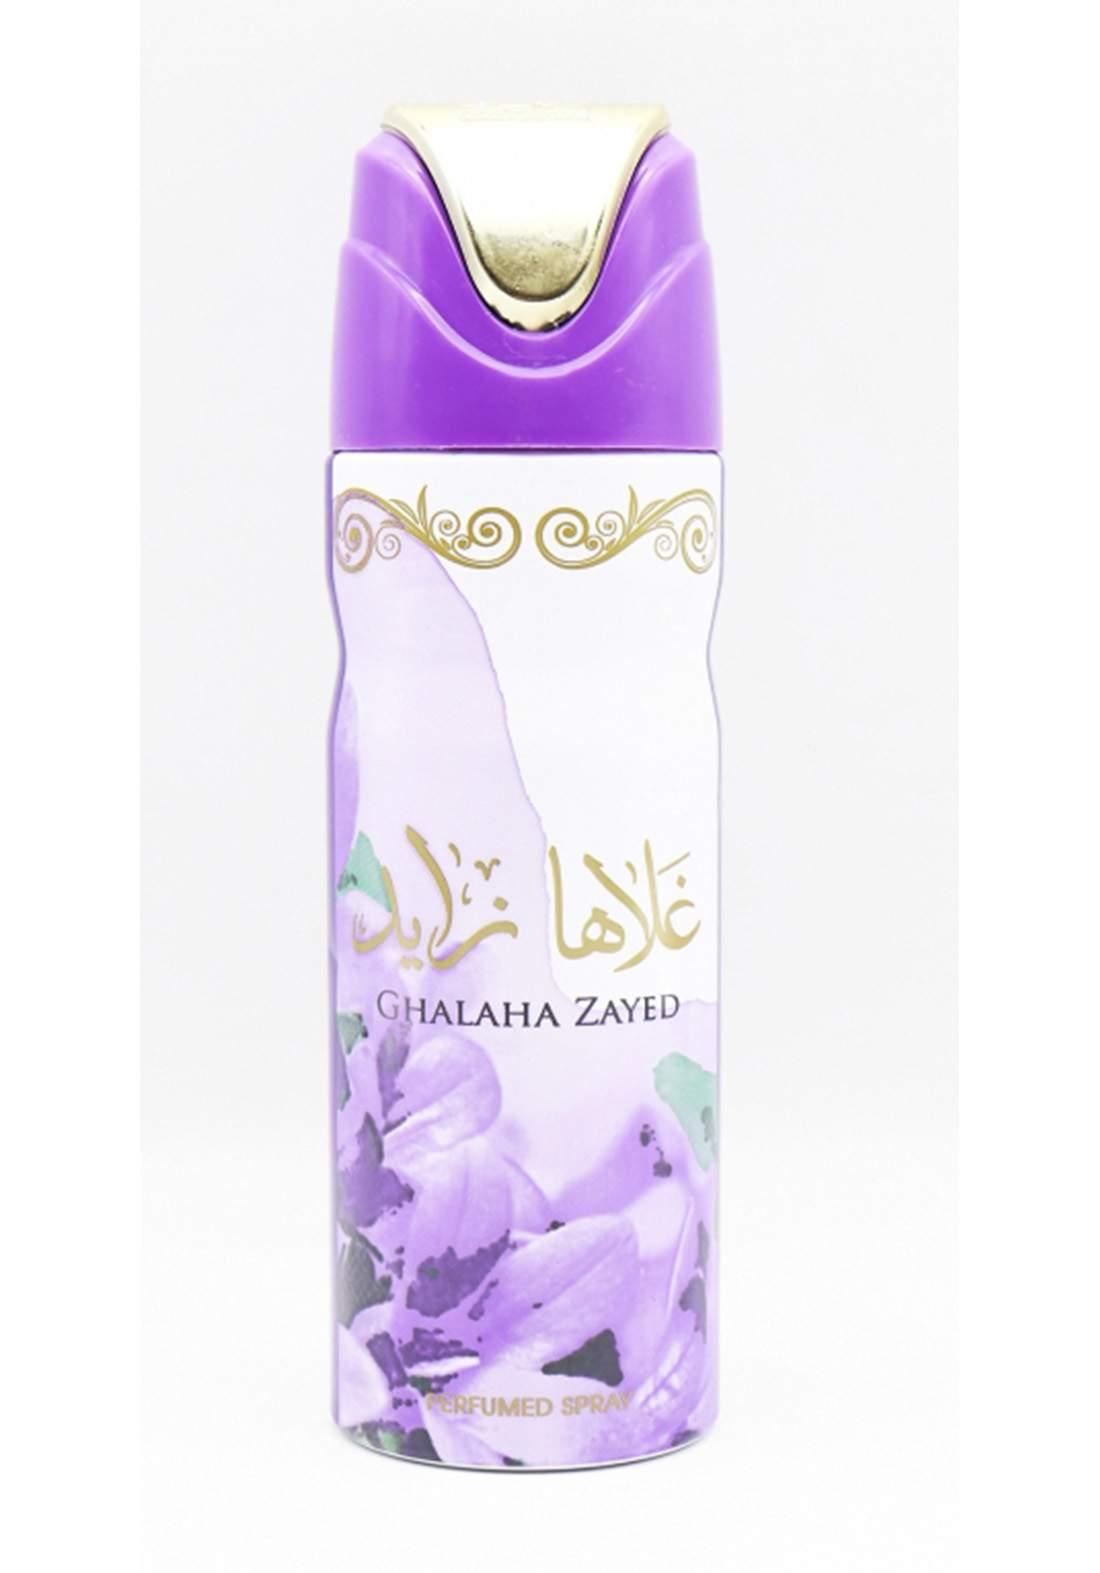 Ard Al Khaleej Ghalaha Zayed Perfumed Spray 200ml For Women بخاخ معطر